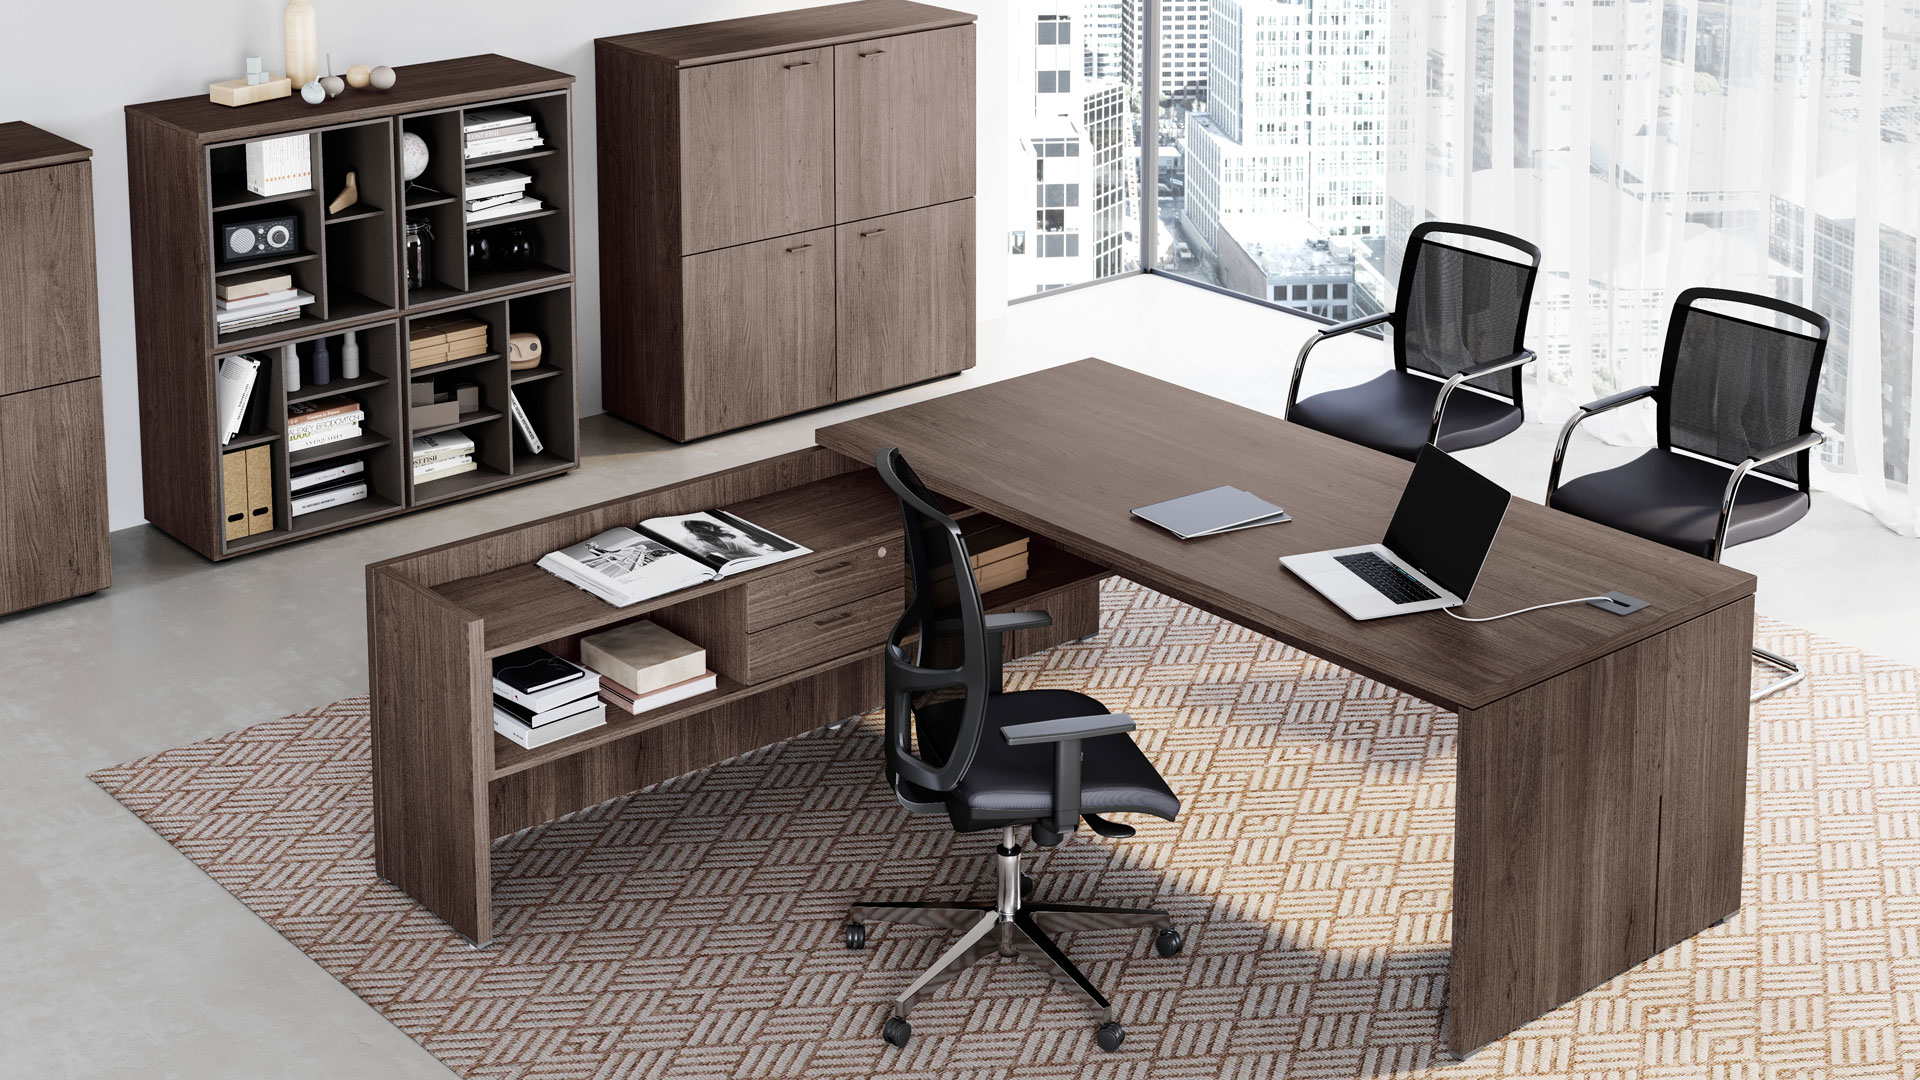 Sedie Ufficio Forsit : Sedie ufficio u electracomputersas